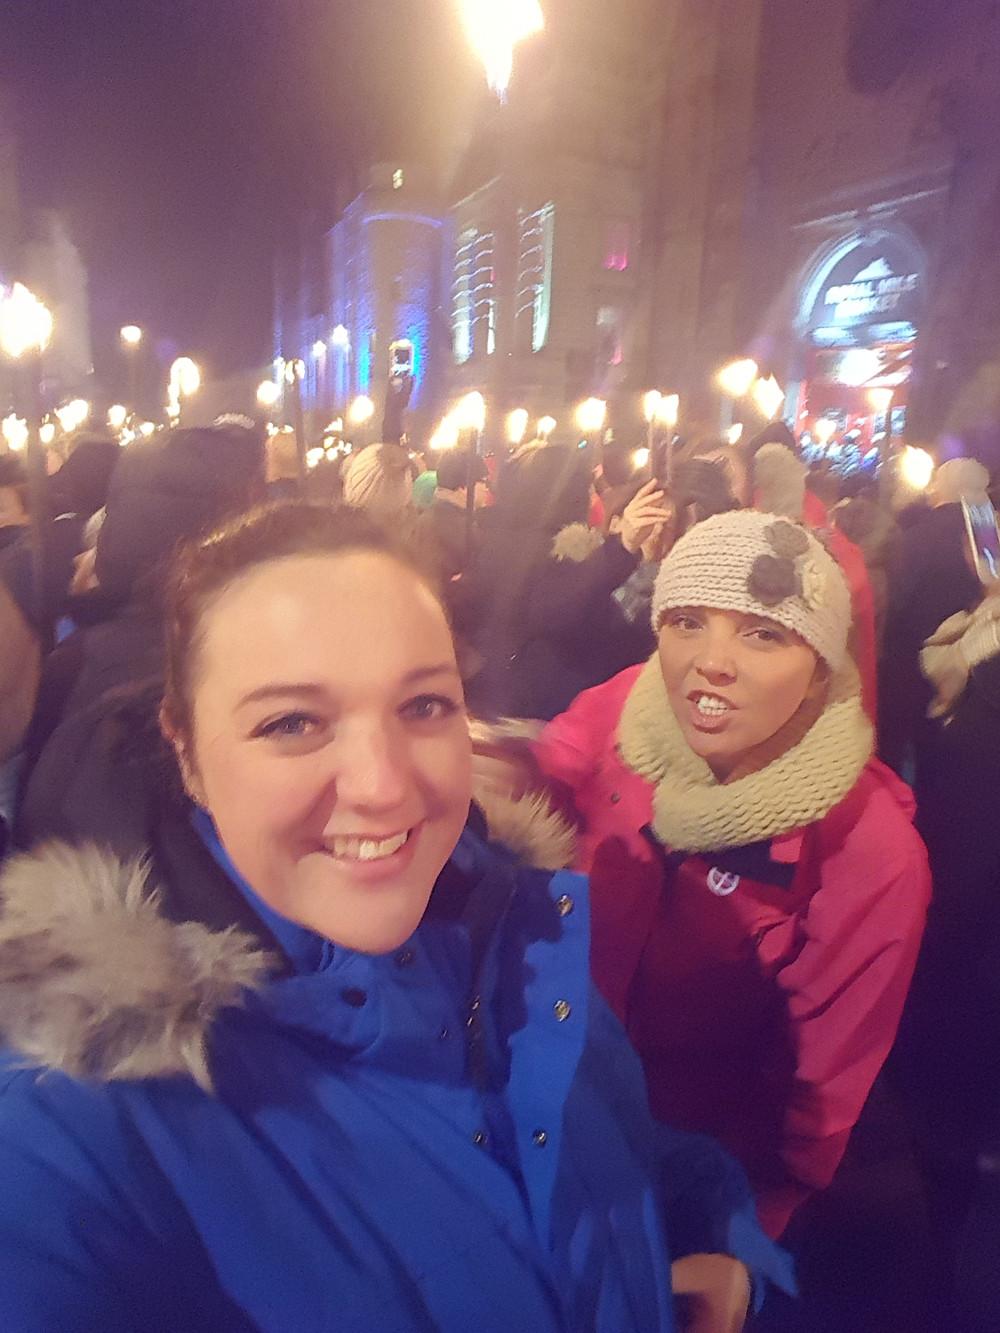 Torchlight Procession, Edinburgh, Scotland - Life Itinerant